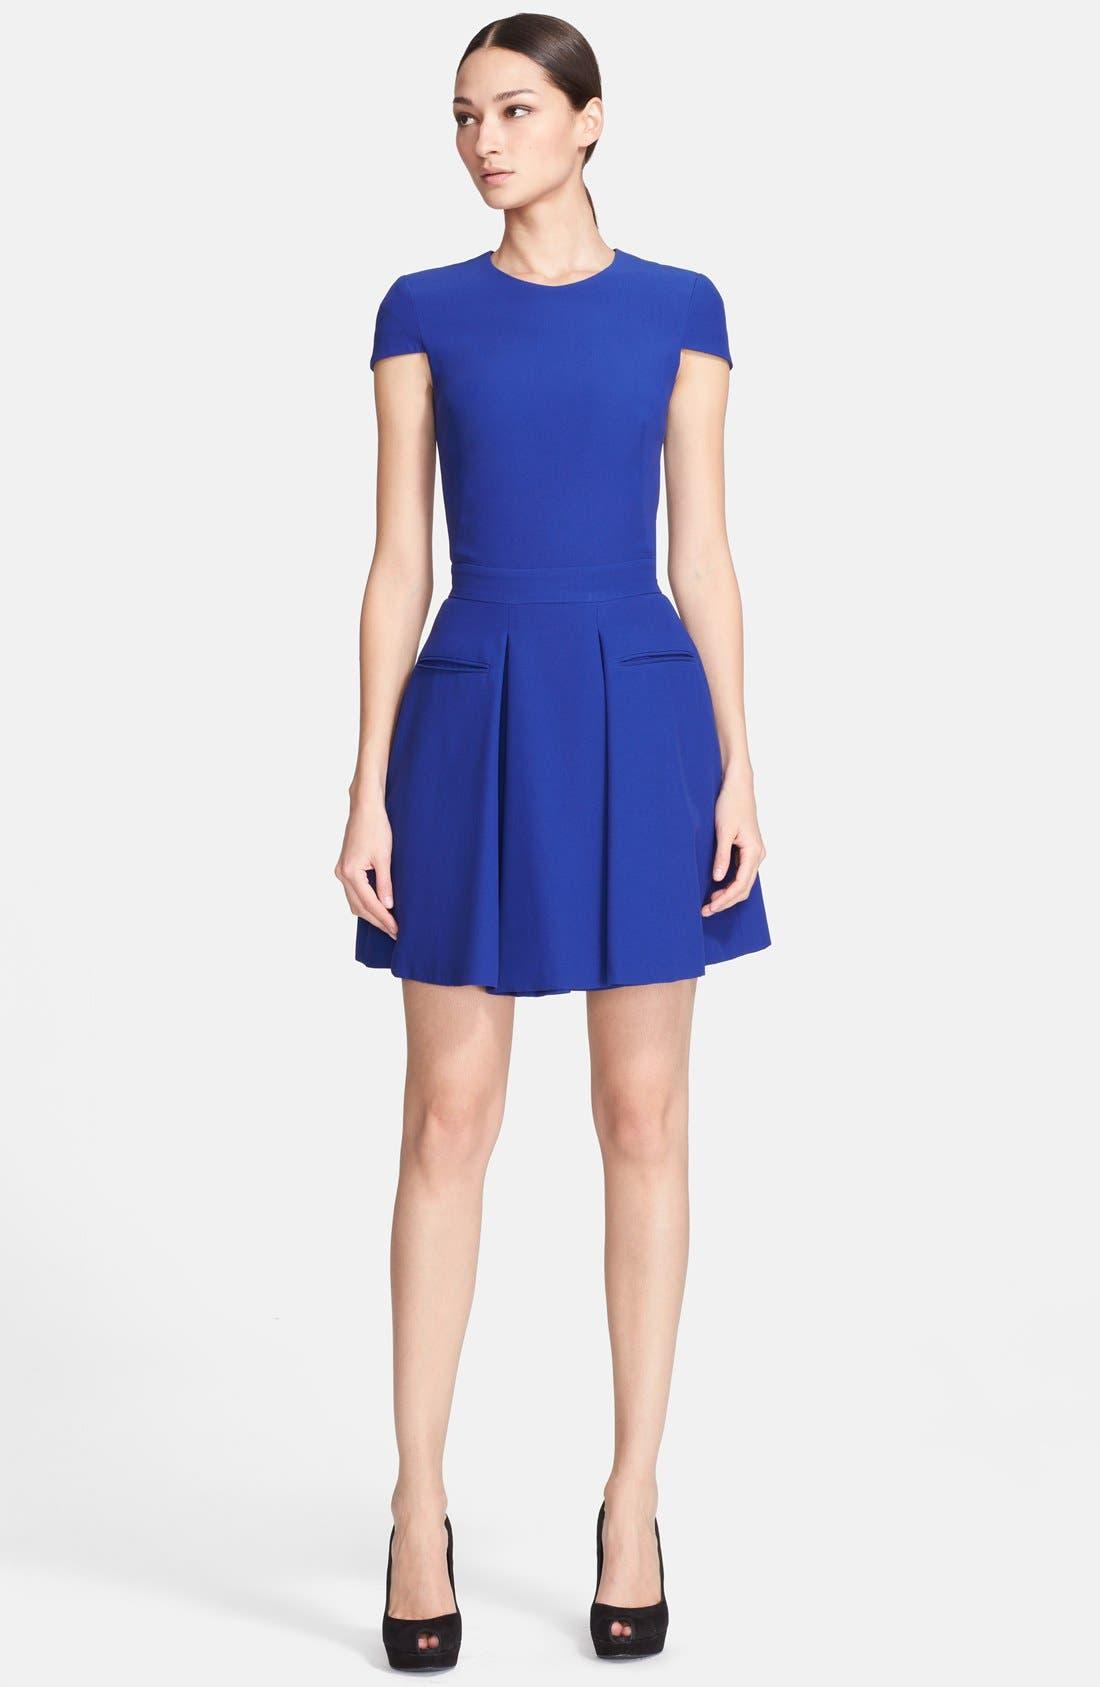 Alternate Image 1 Selected - Alexander McQueen Crepe Dress